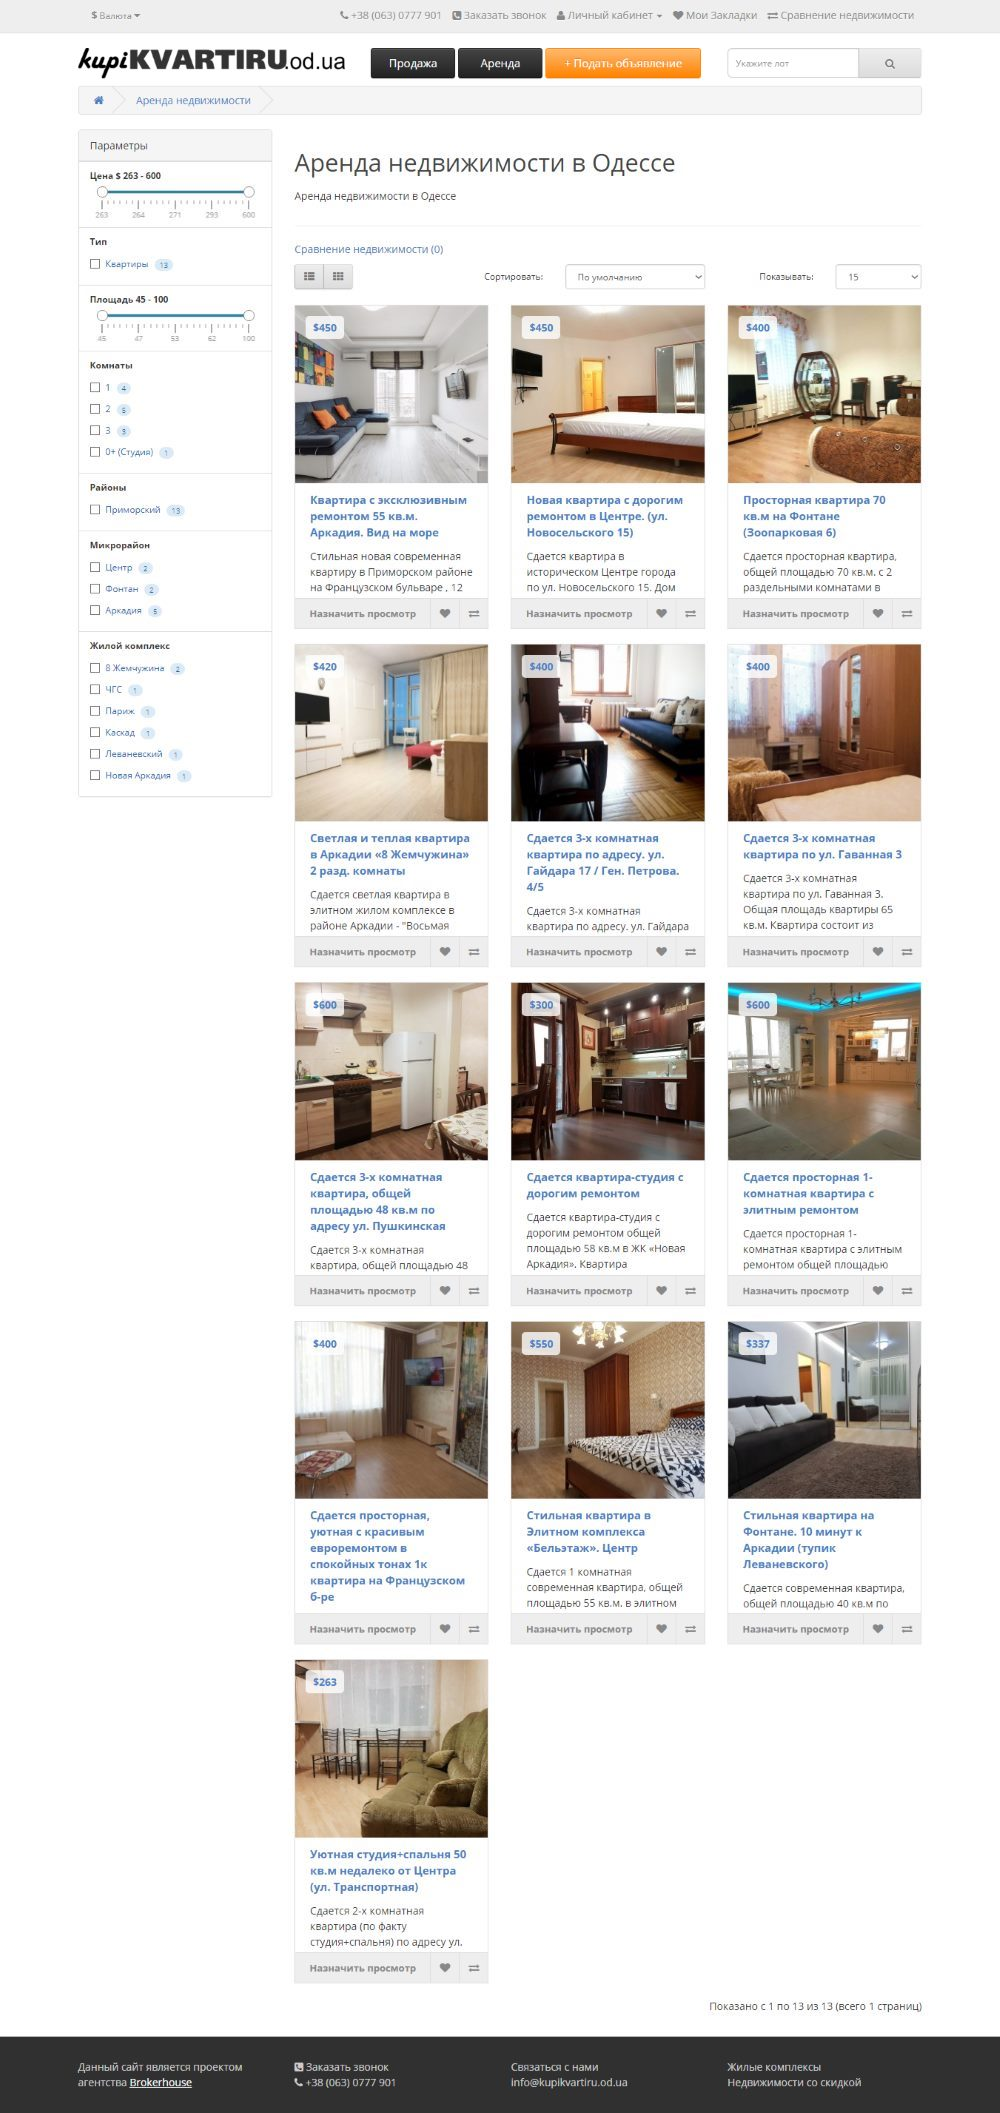 Сайт по продаже недвижимости в дубае omega hotel 4 дубай